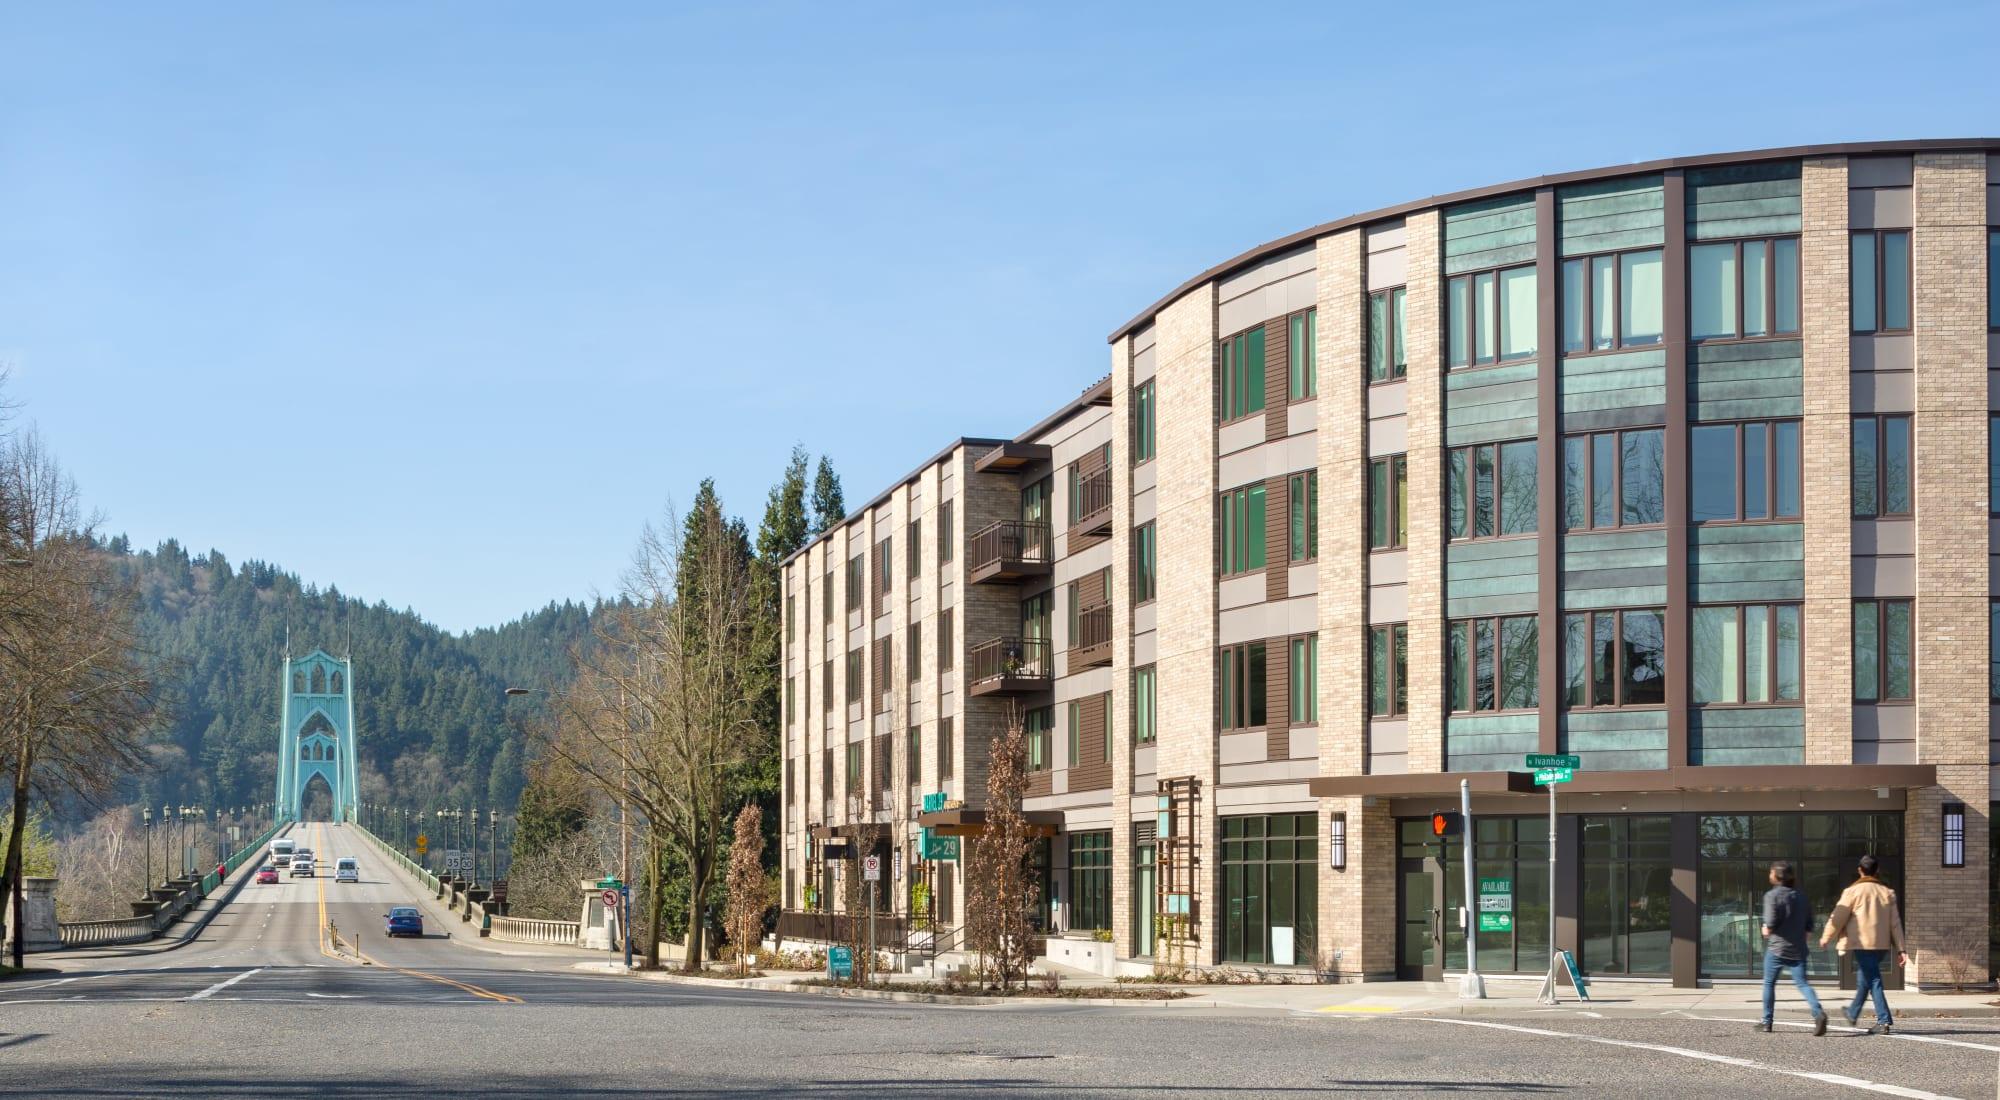 Marvel 29 apartments in Portland, Oregon